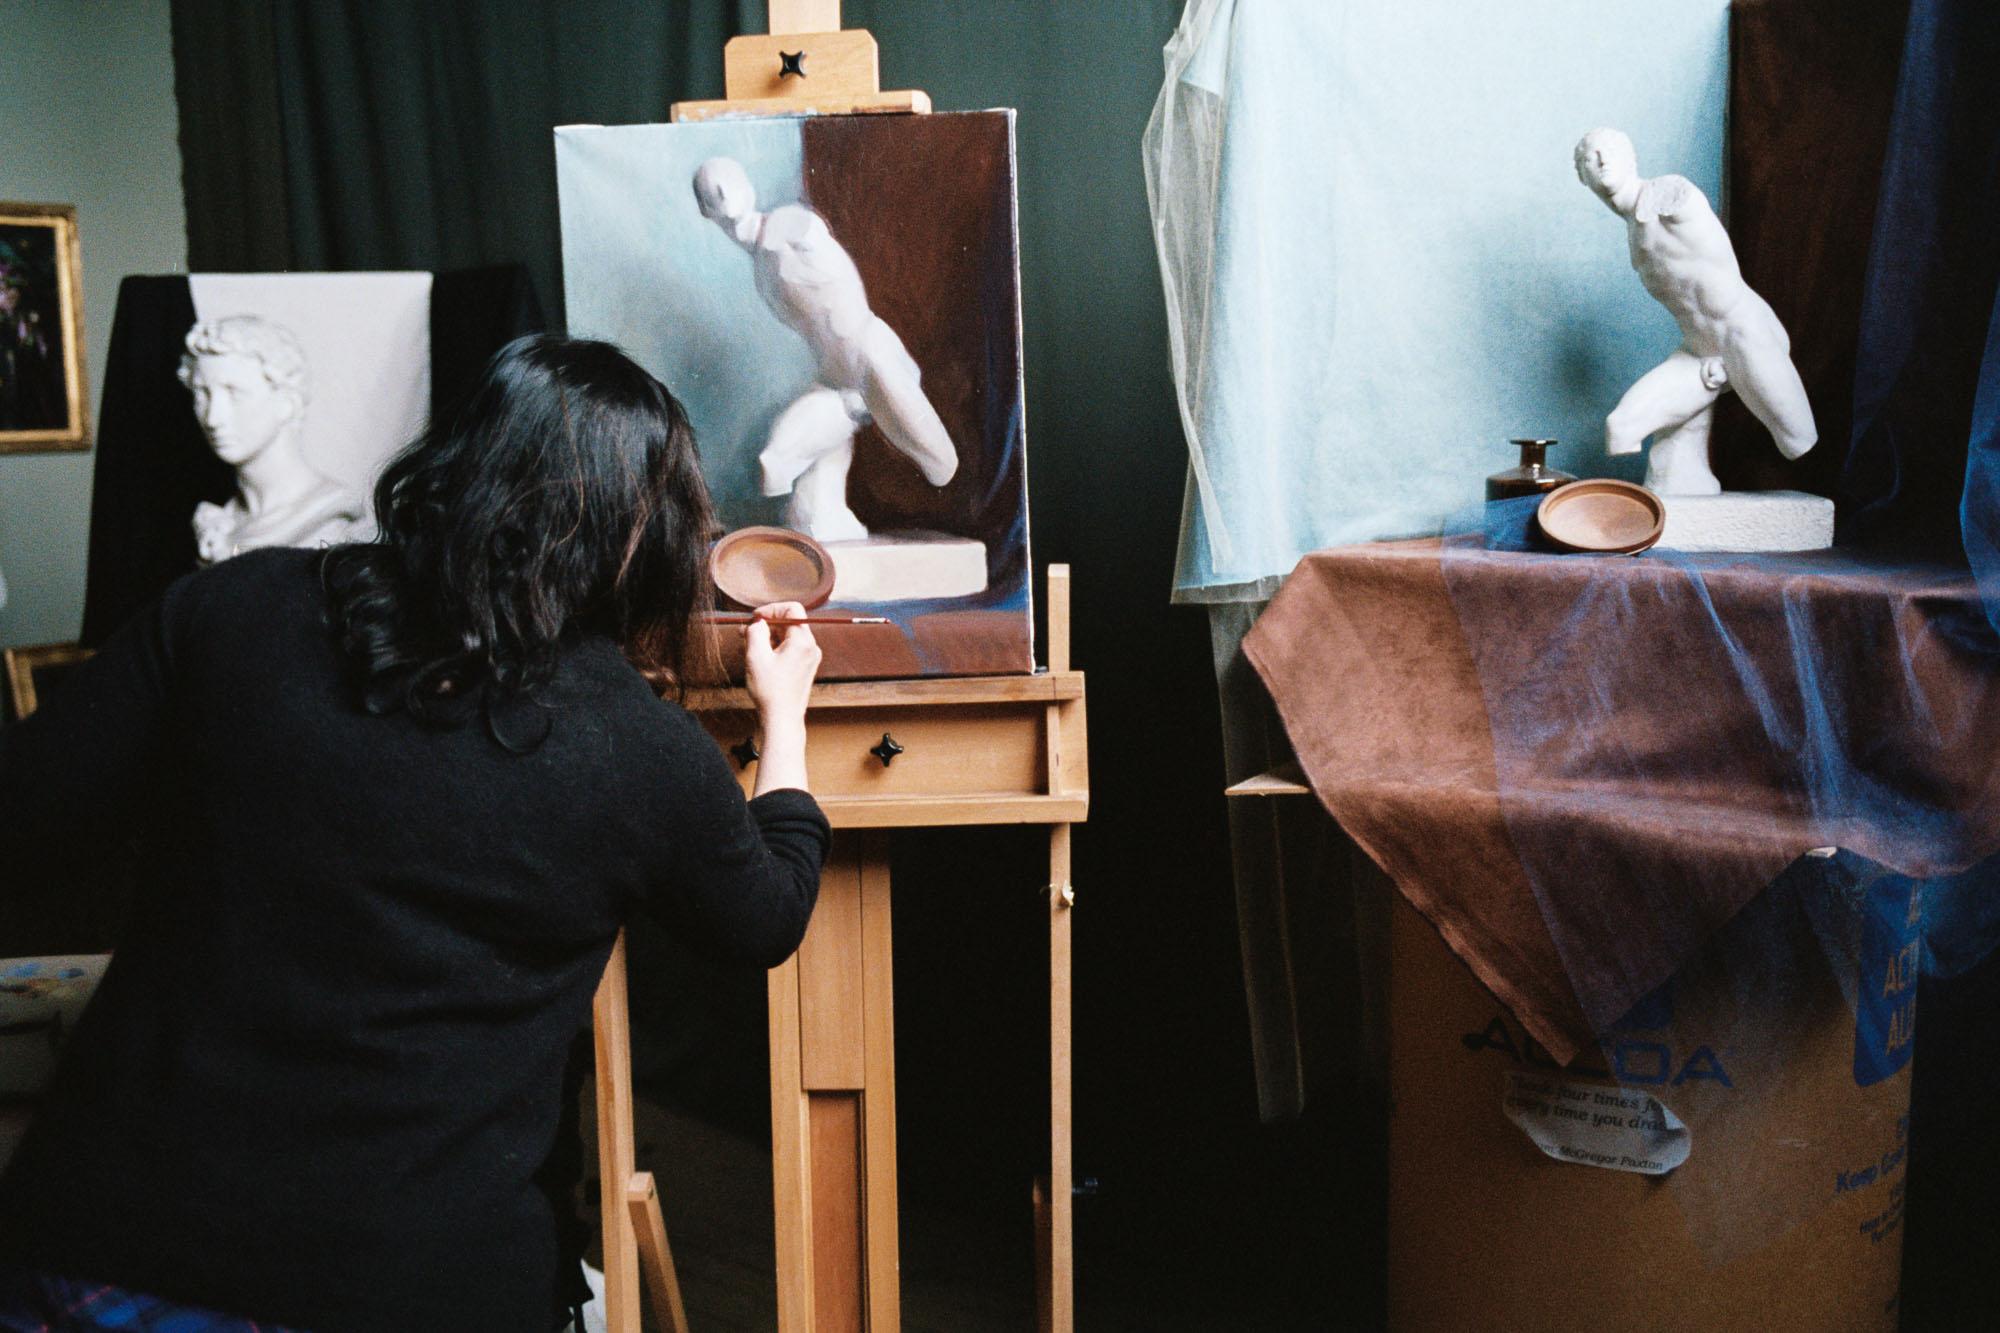 Ingbretson_atelier_by_Lomanno-13.jpg